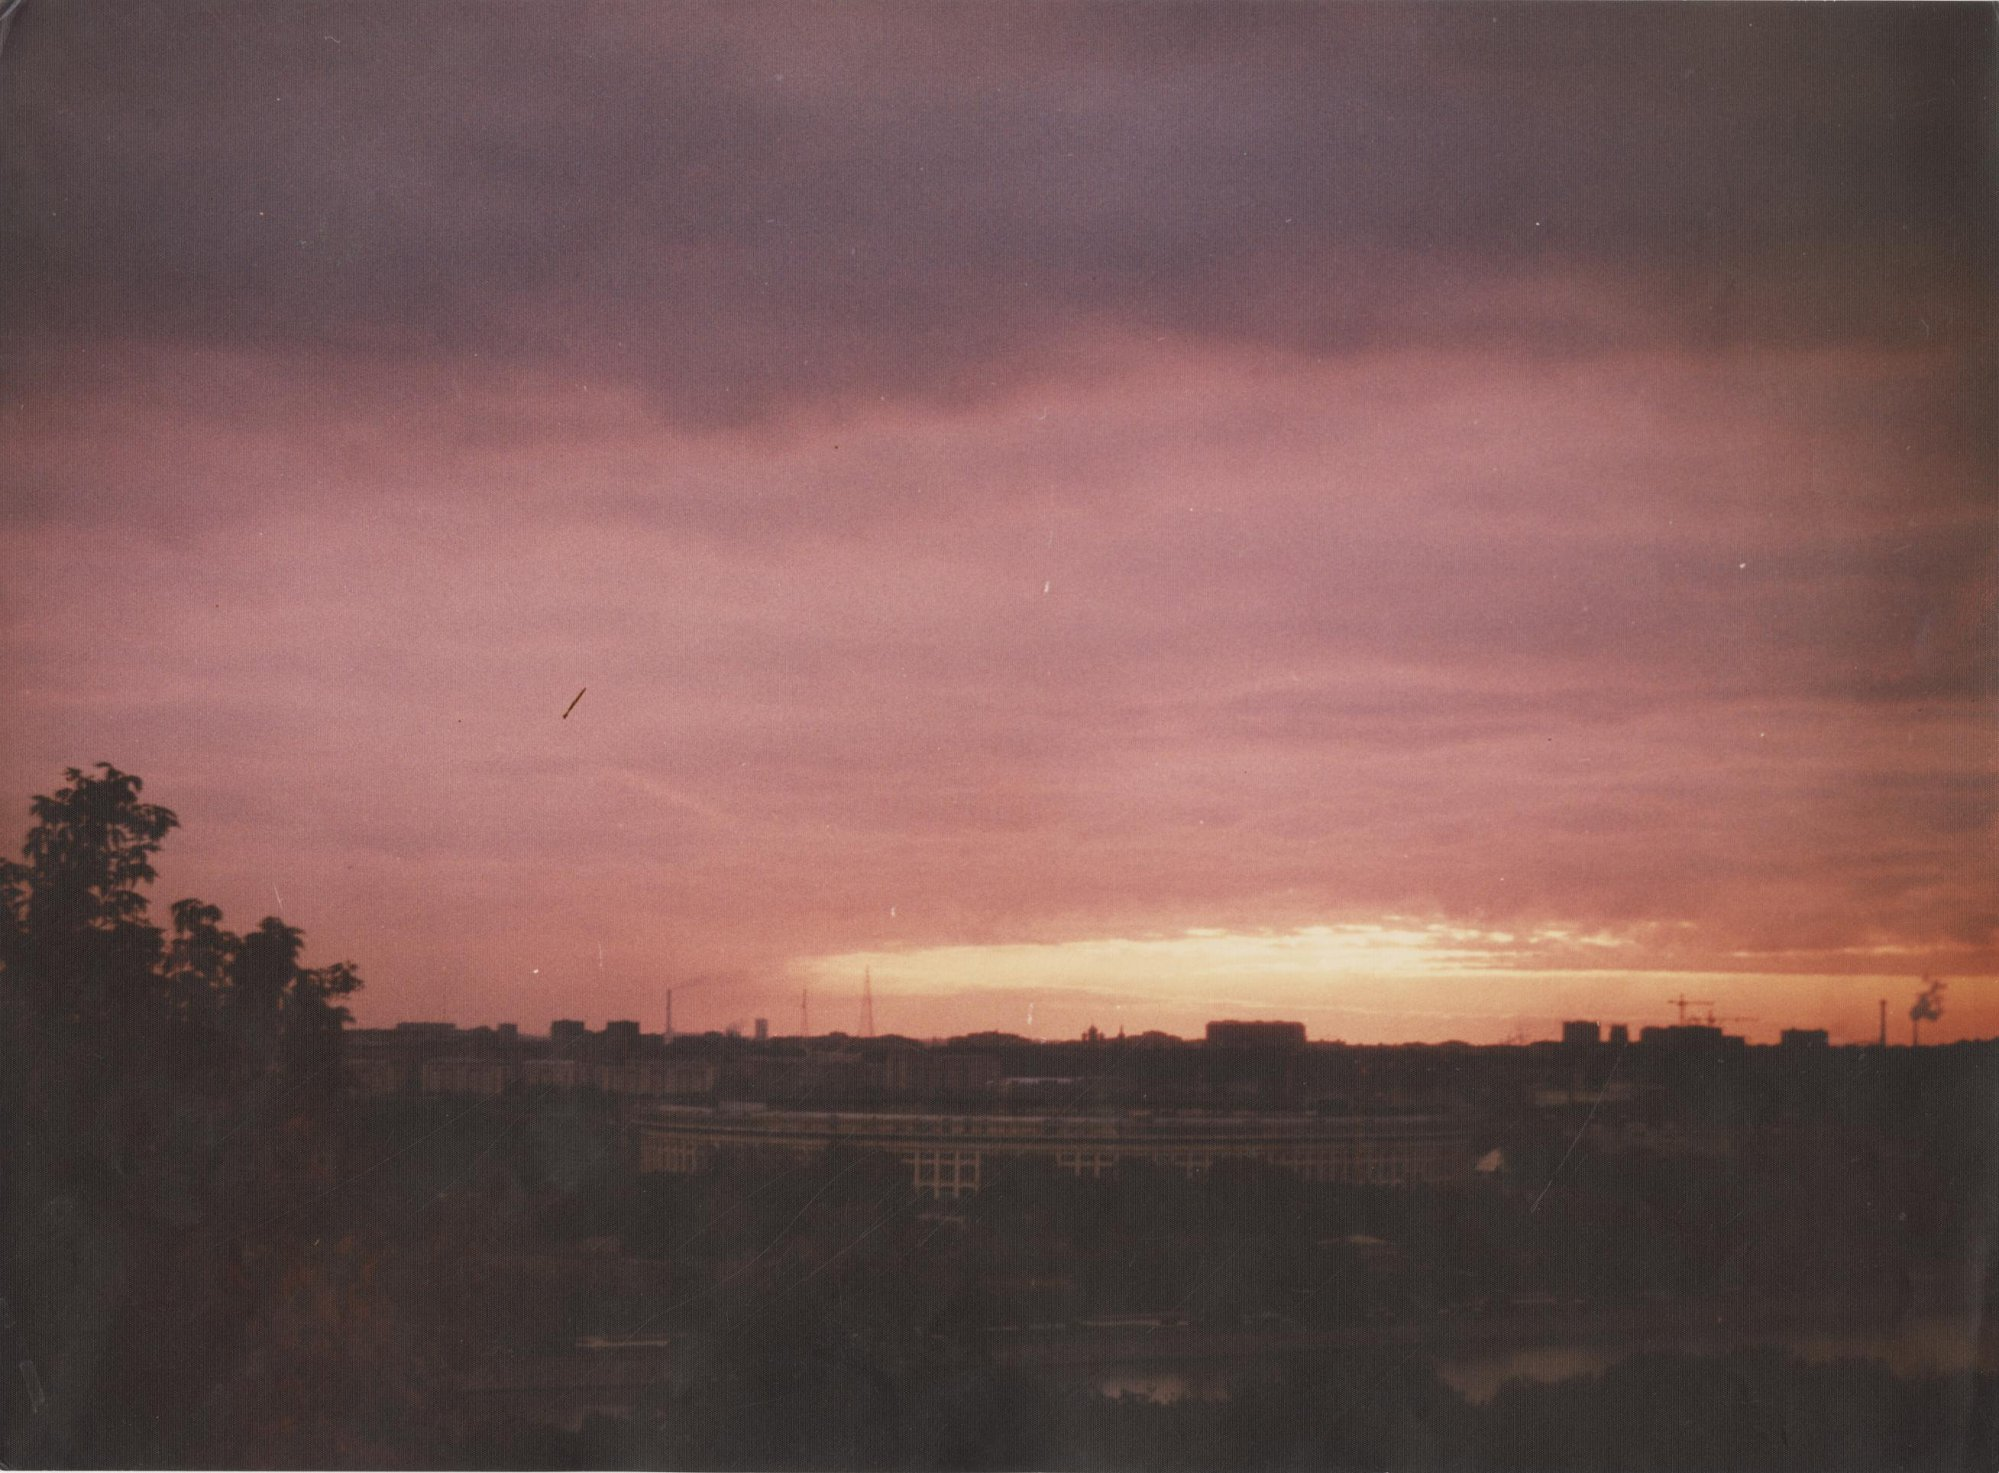 1980-е. Вид на Центральный стадион во время заката